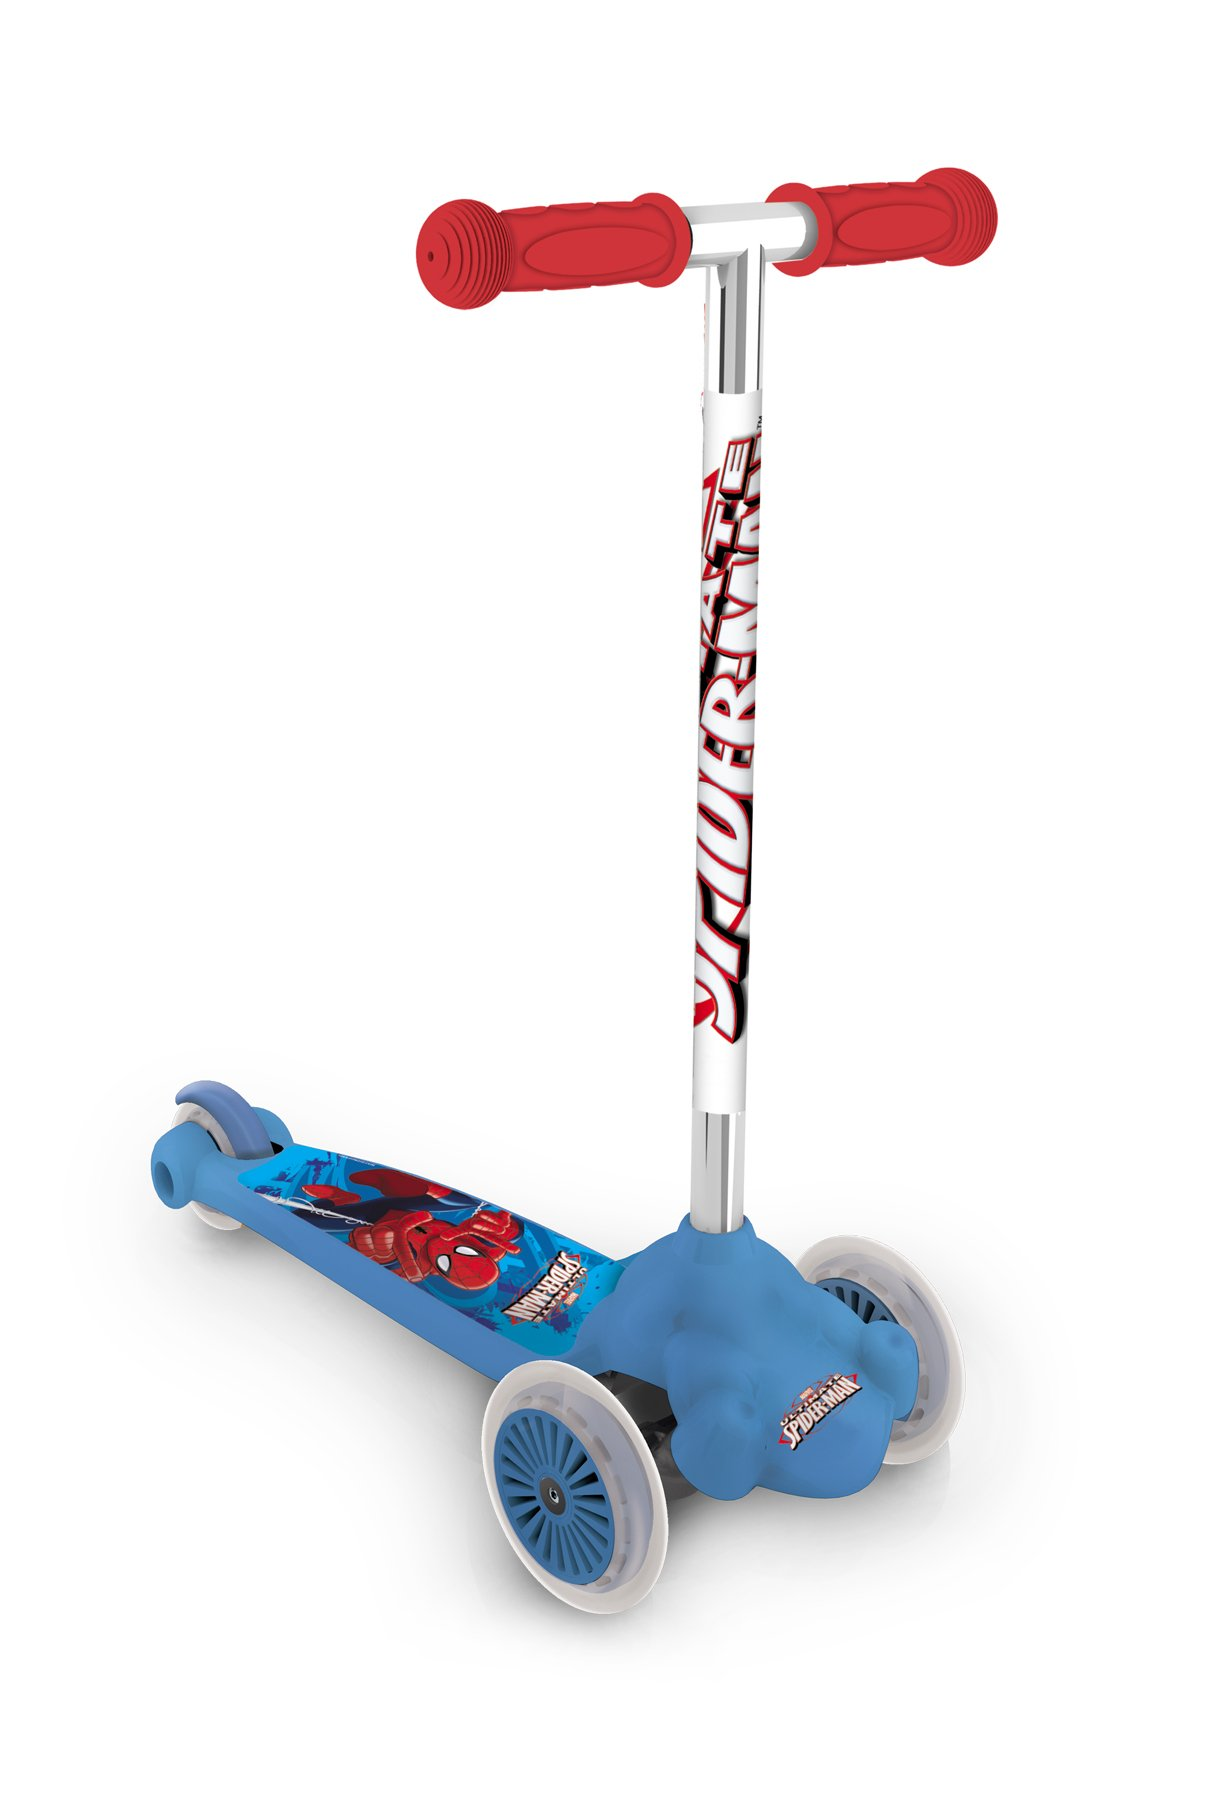 Mondo 18395 - Ultimate Spiderman Twist & roll, patinete 2 ruedas delanteras product image